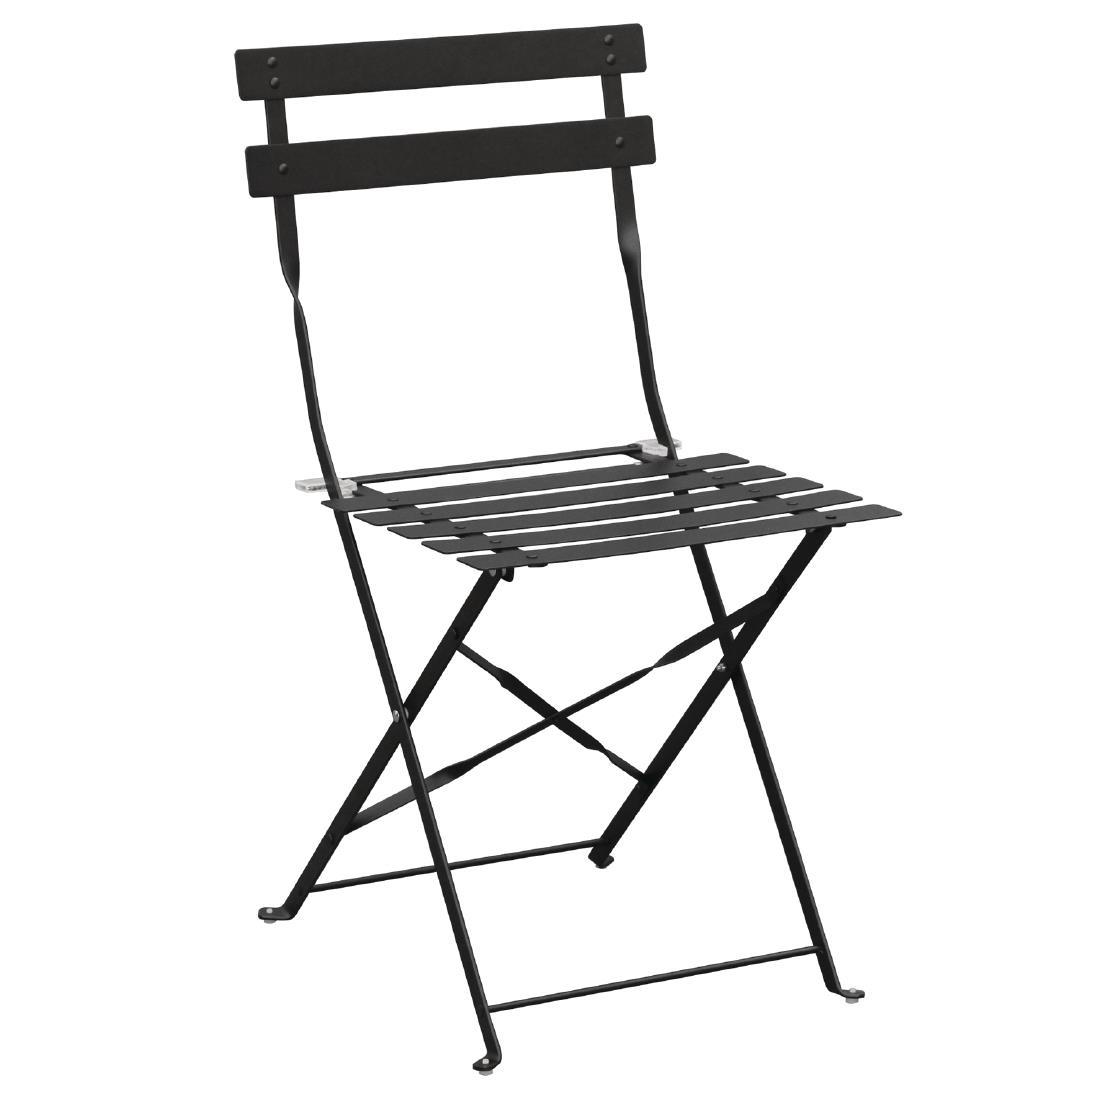 Steel Folding Chair - Black